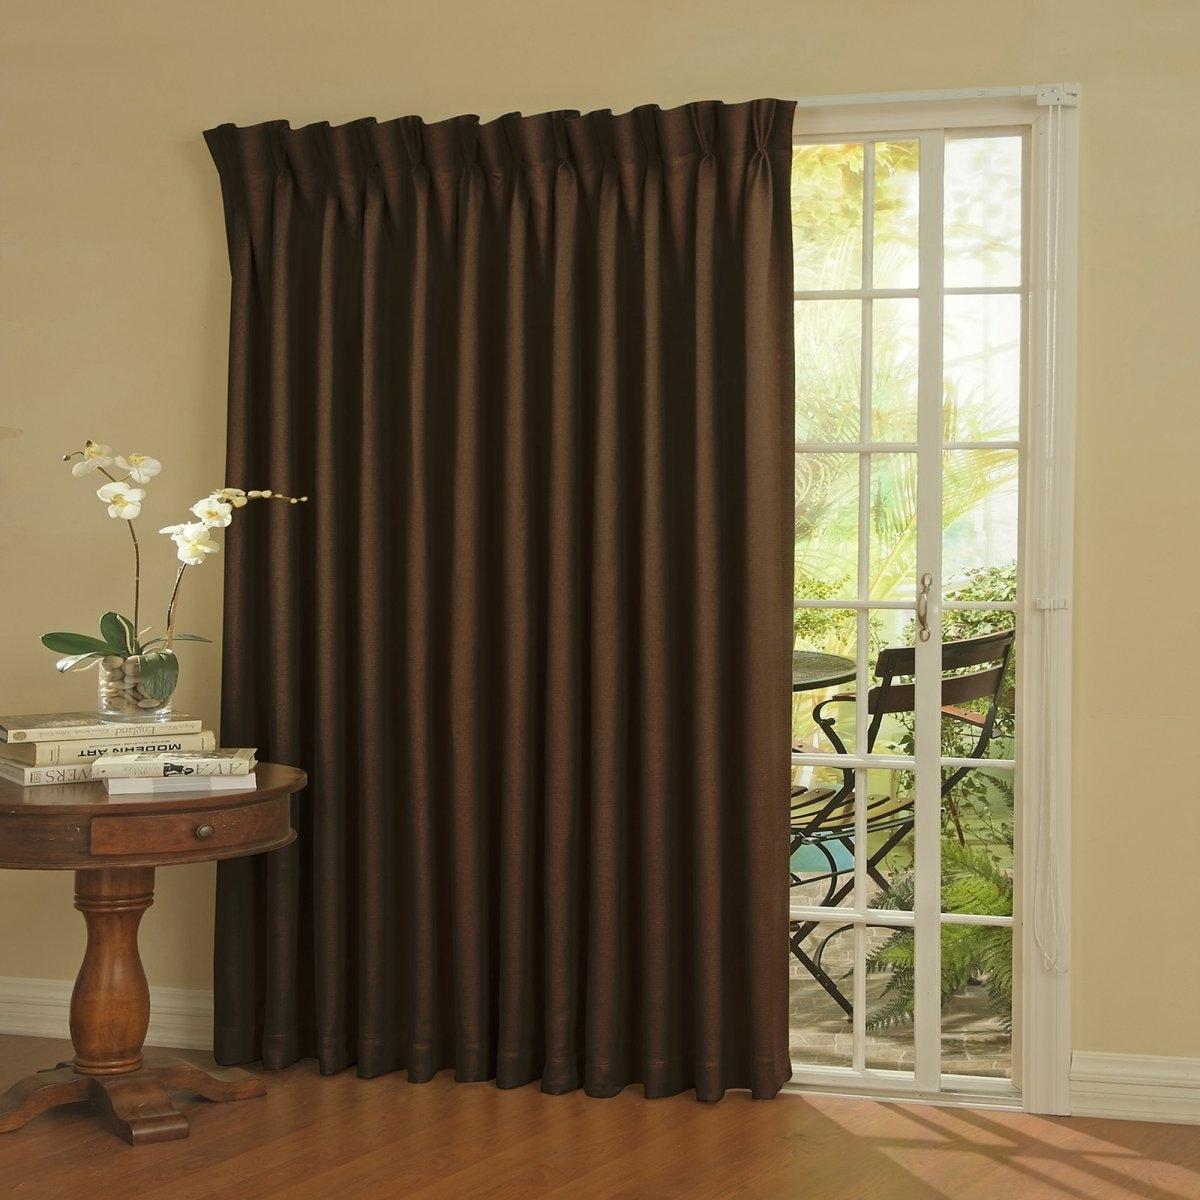 Insulated Sliding Glass Door CurtainsInsulated Sliding Glass Door Curtains